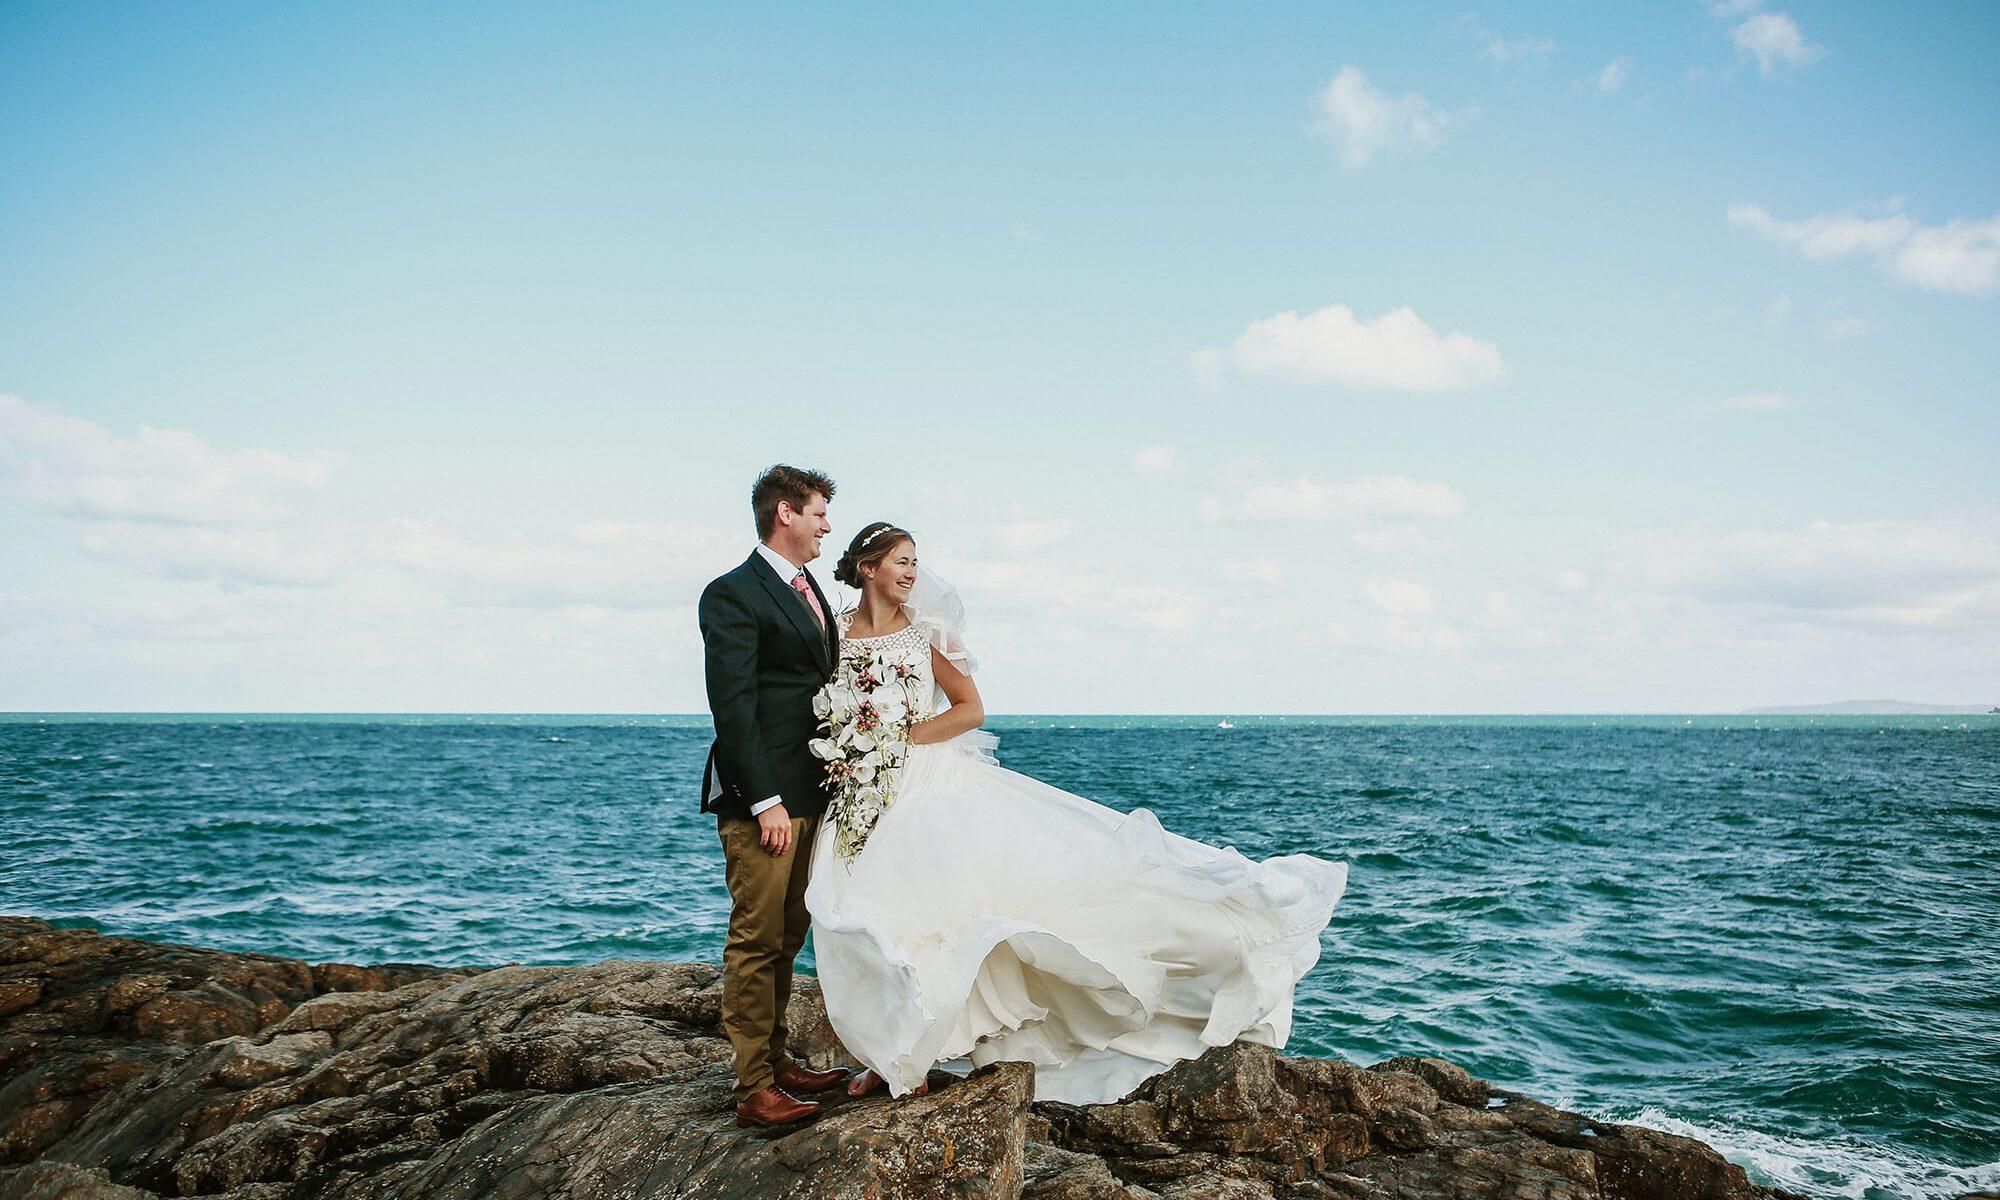 Carbis Bay Hotel Wedding Photographer 2000x1200 - Photography Style